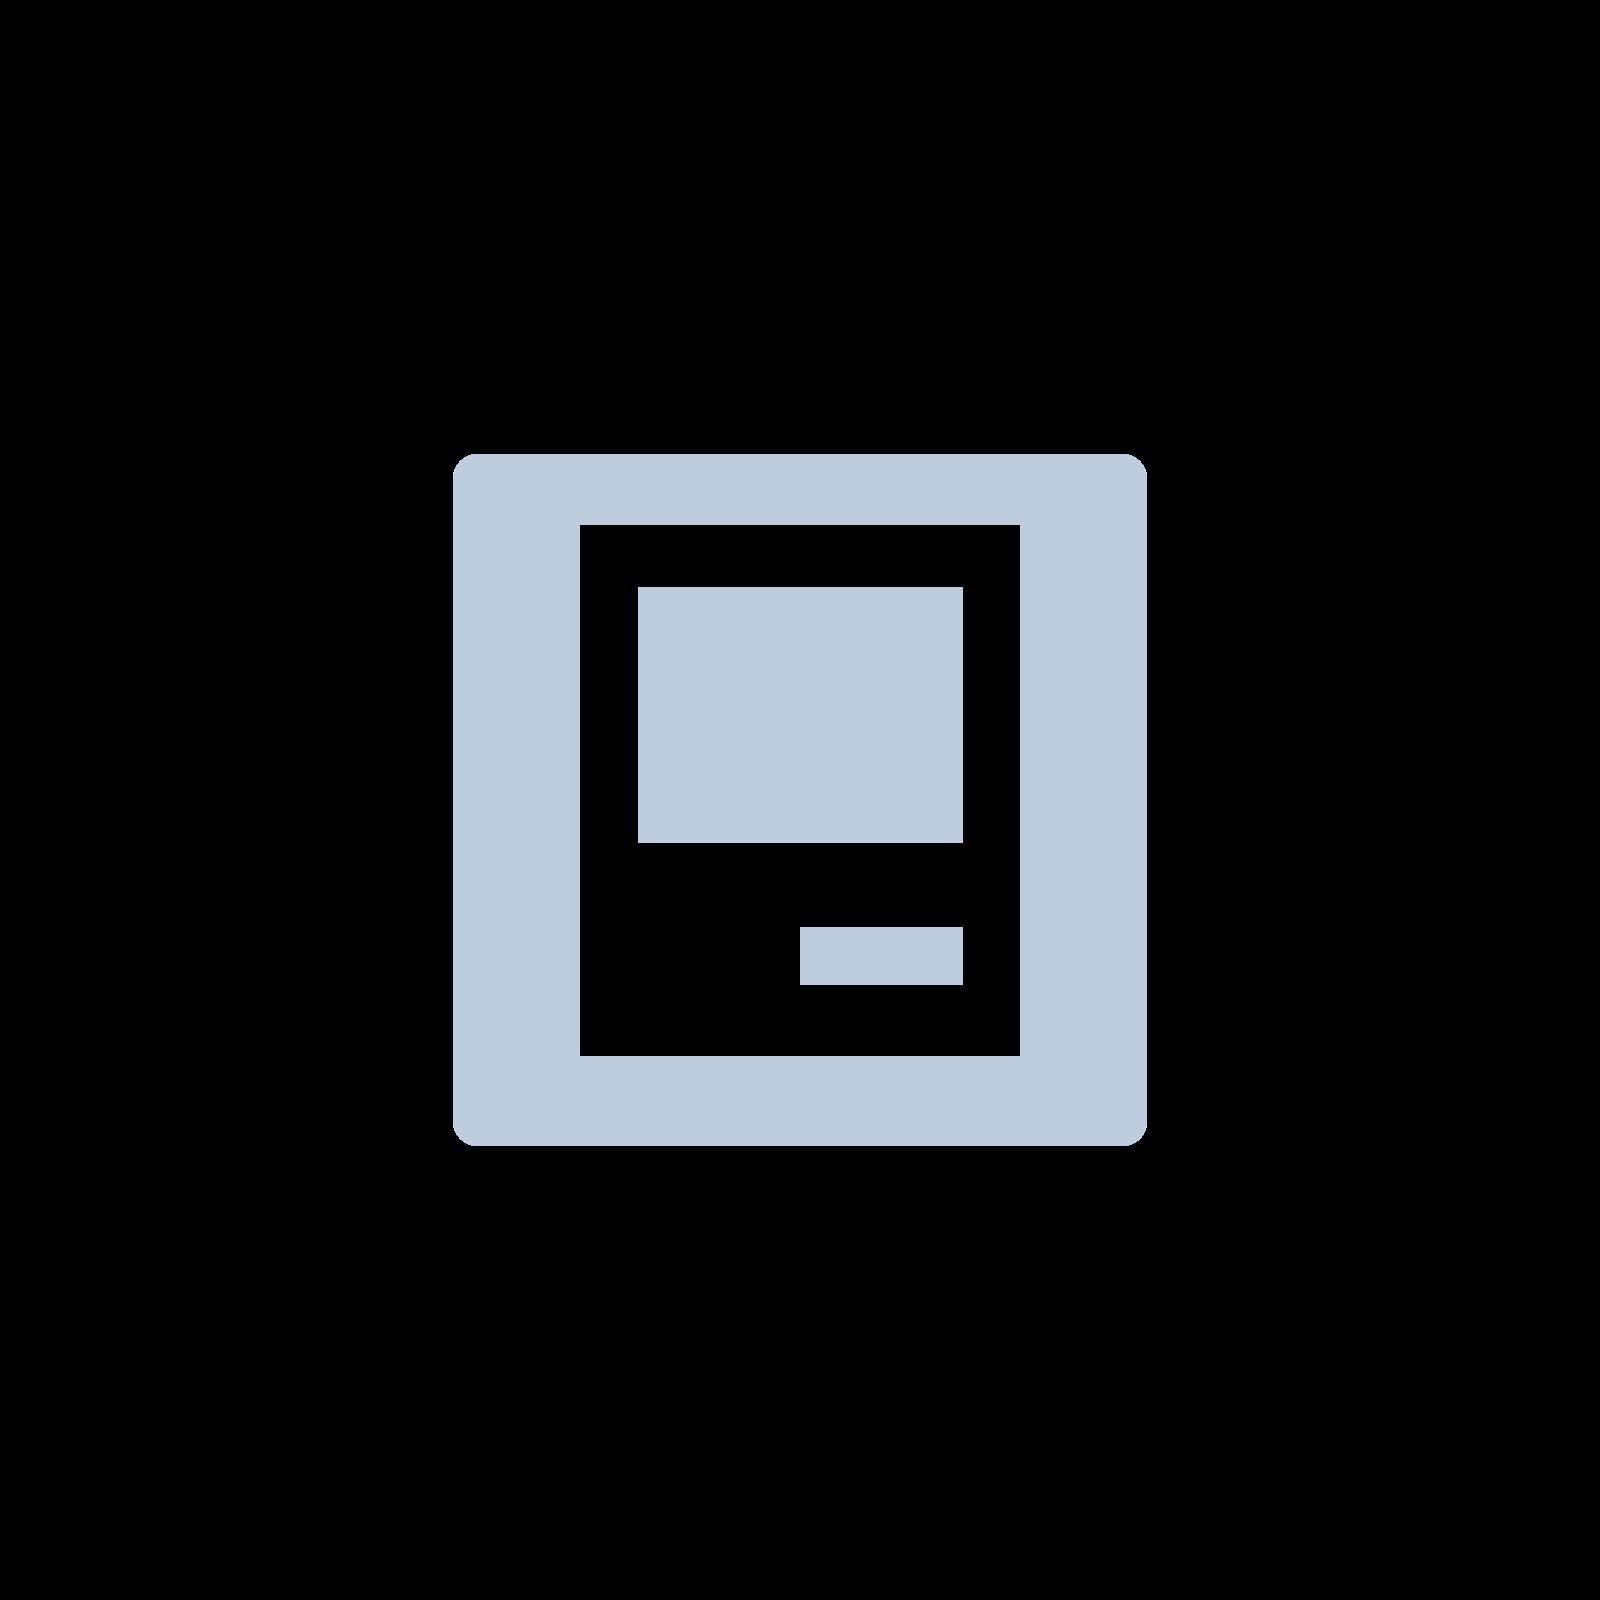 Mac mini Intel Core 2 Duo 2.4GHz (MacMini4,1, 320GB, 4GB)